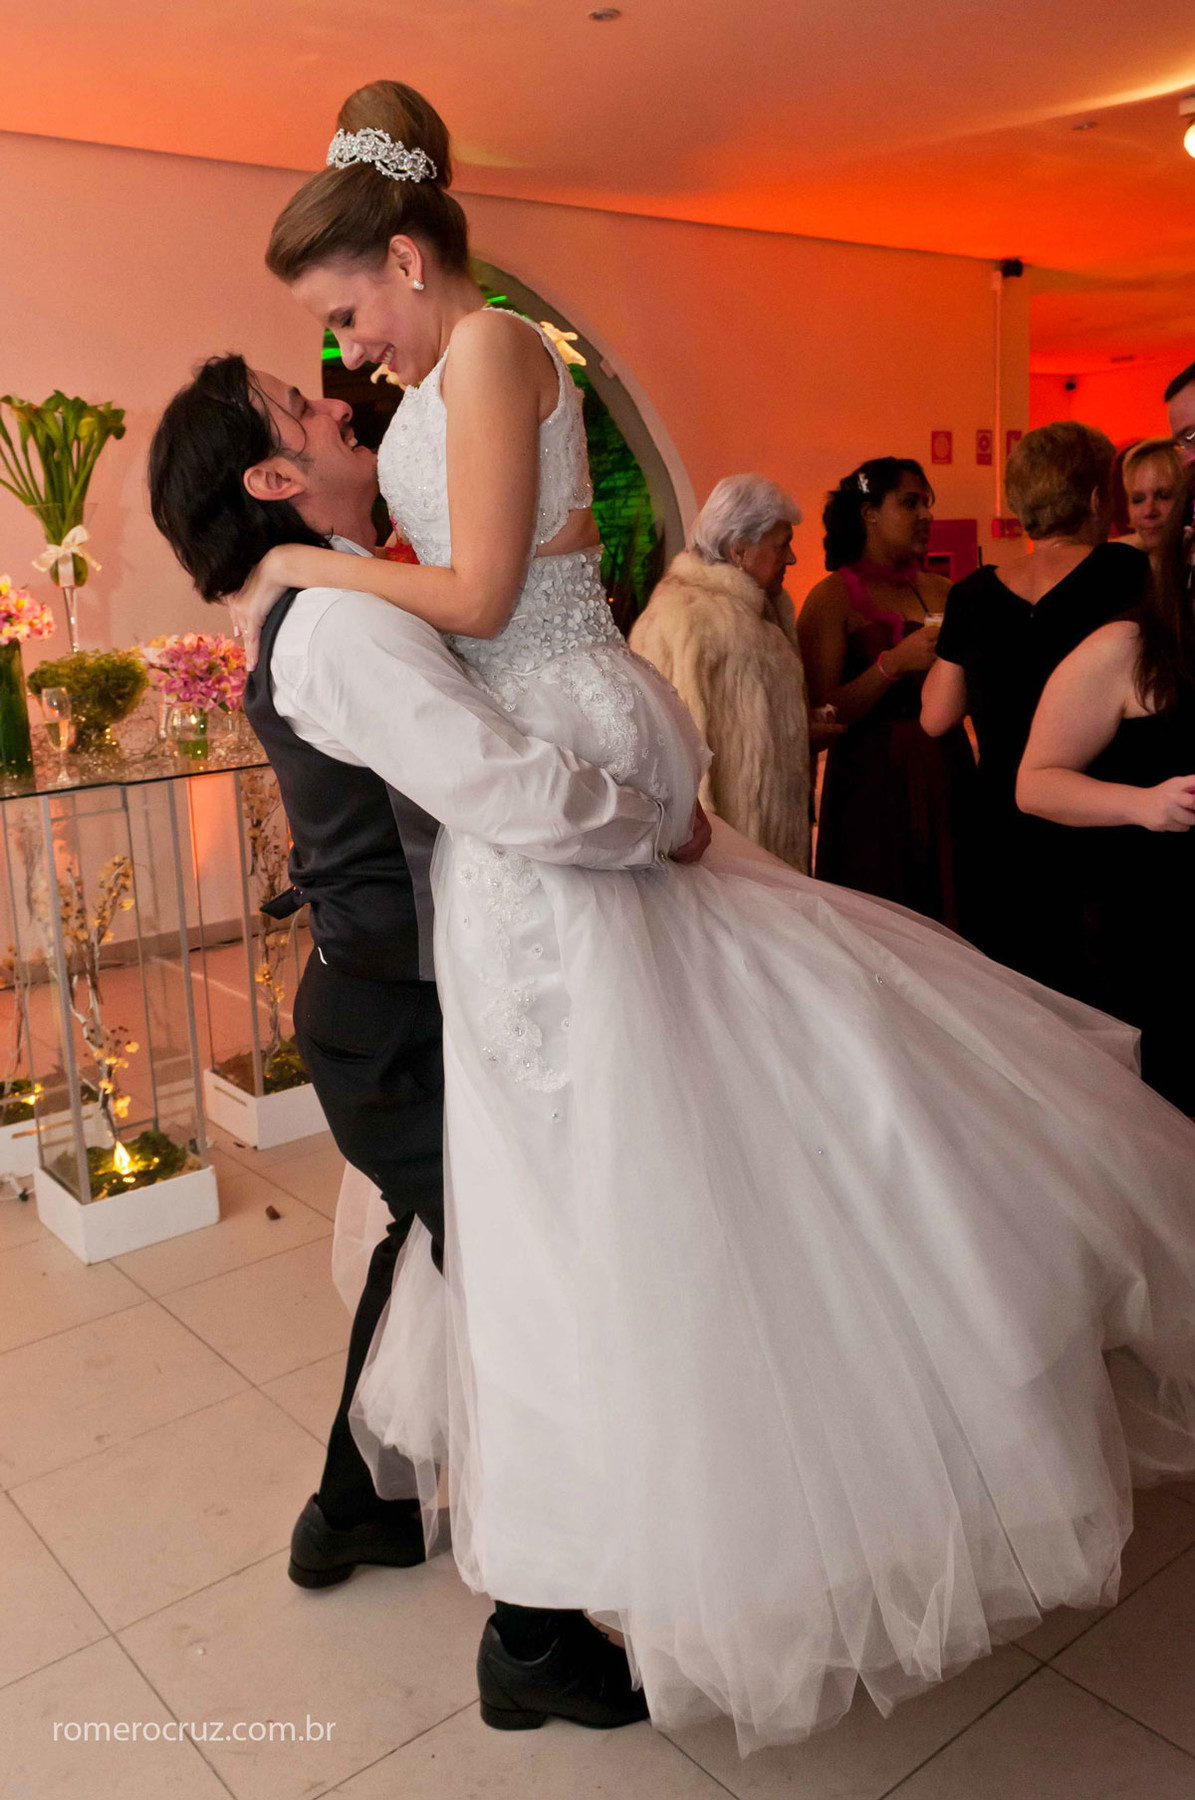 fotografia do momento dos noivos na festa de casamento